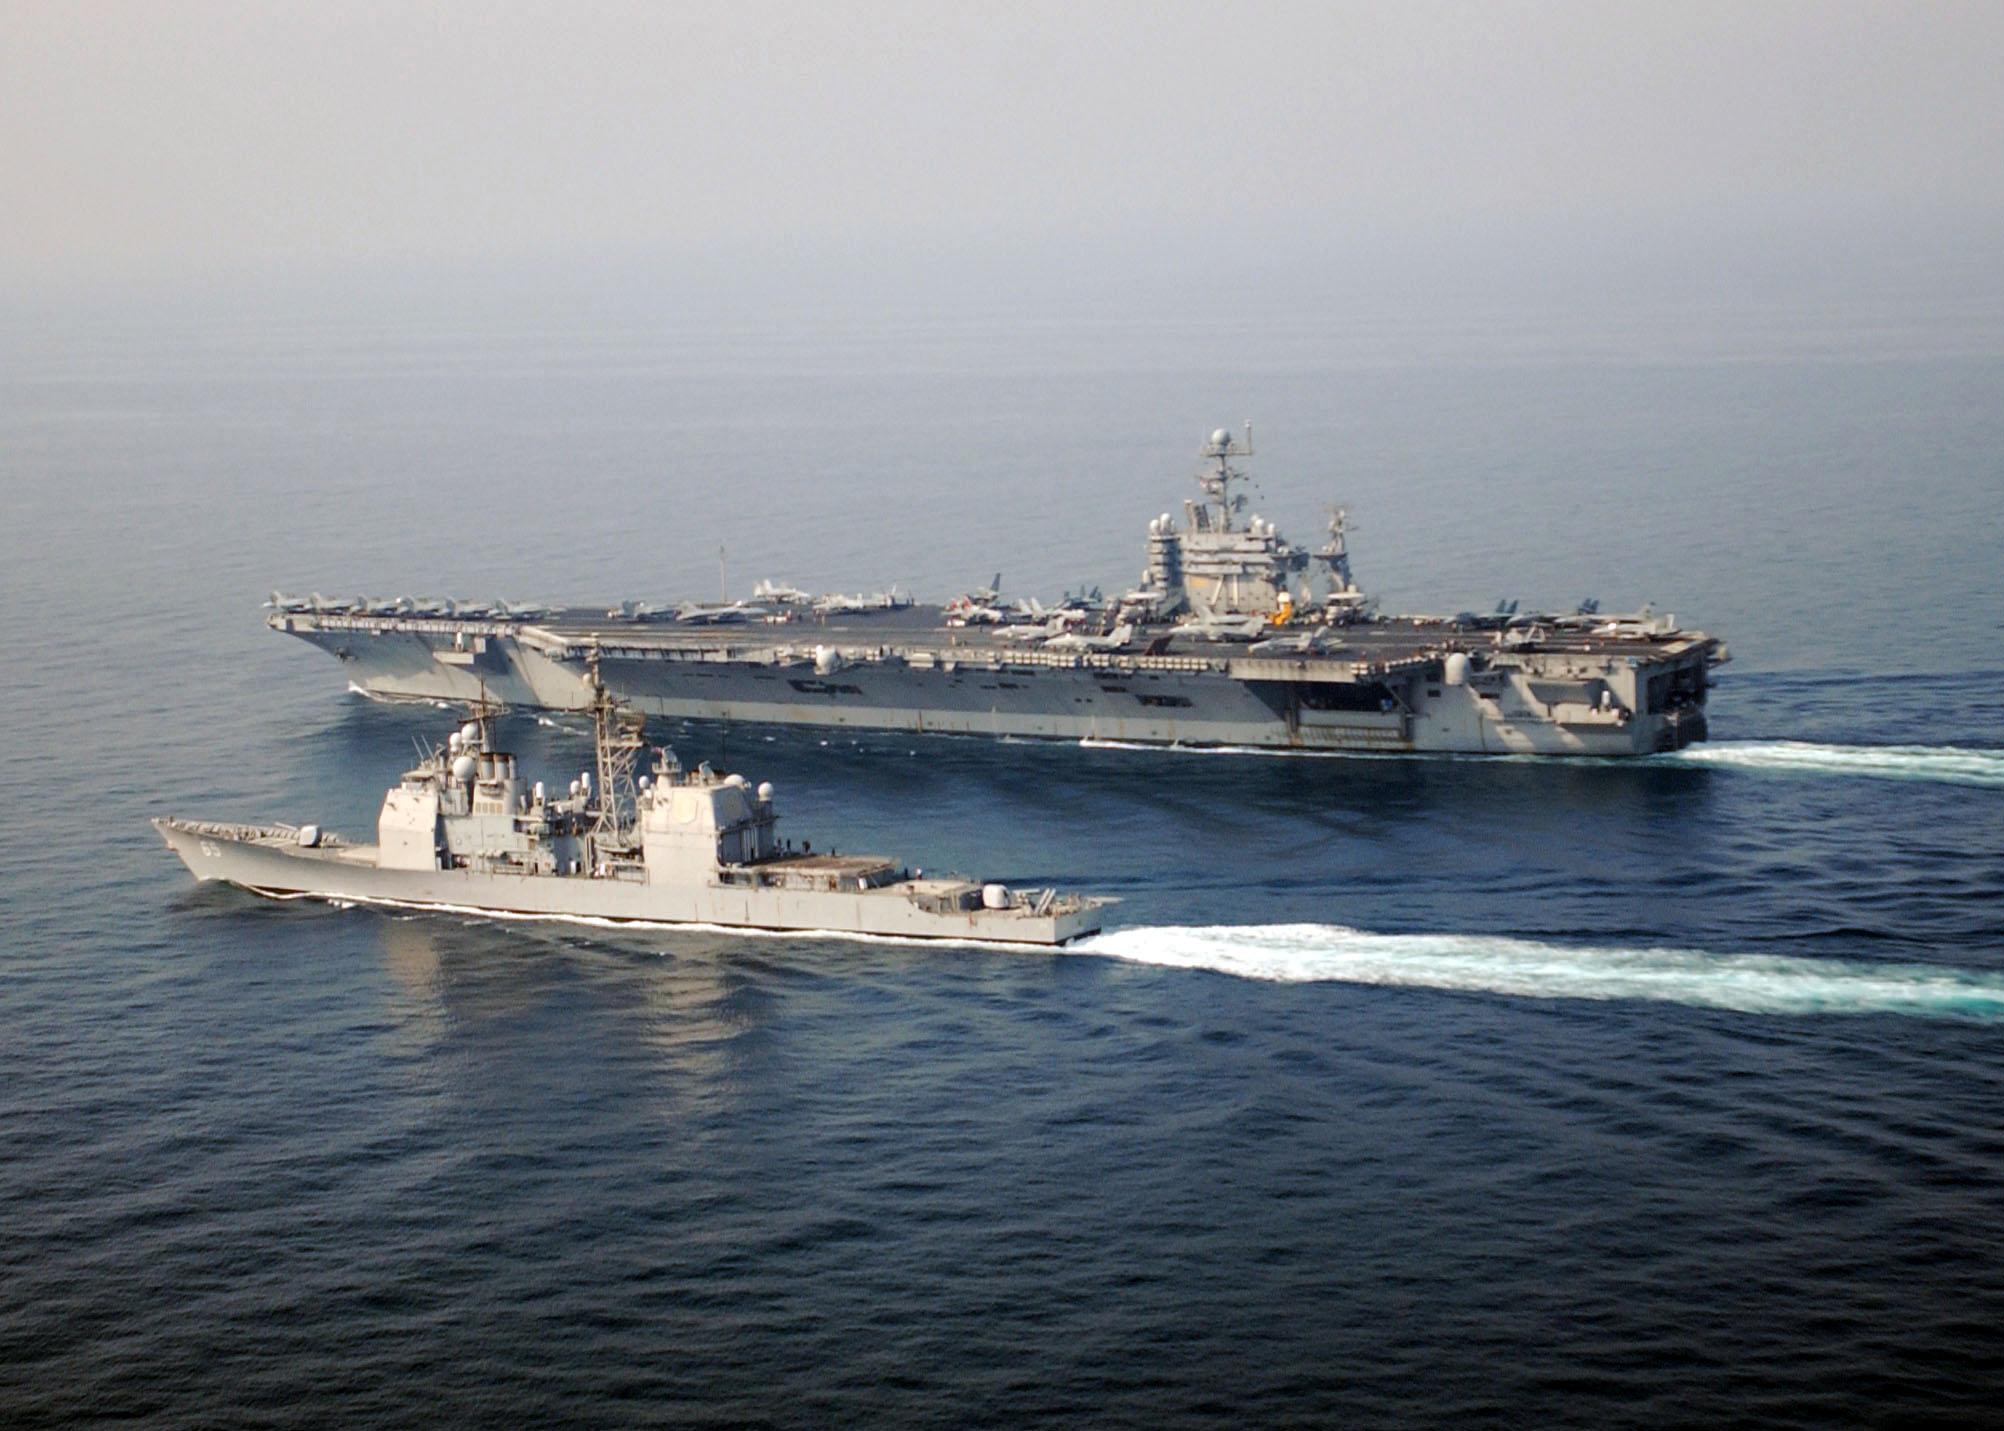 USS Chosin (CG 65) alongside USS Theodore Roosevelt (CVN 71)